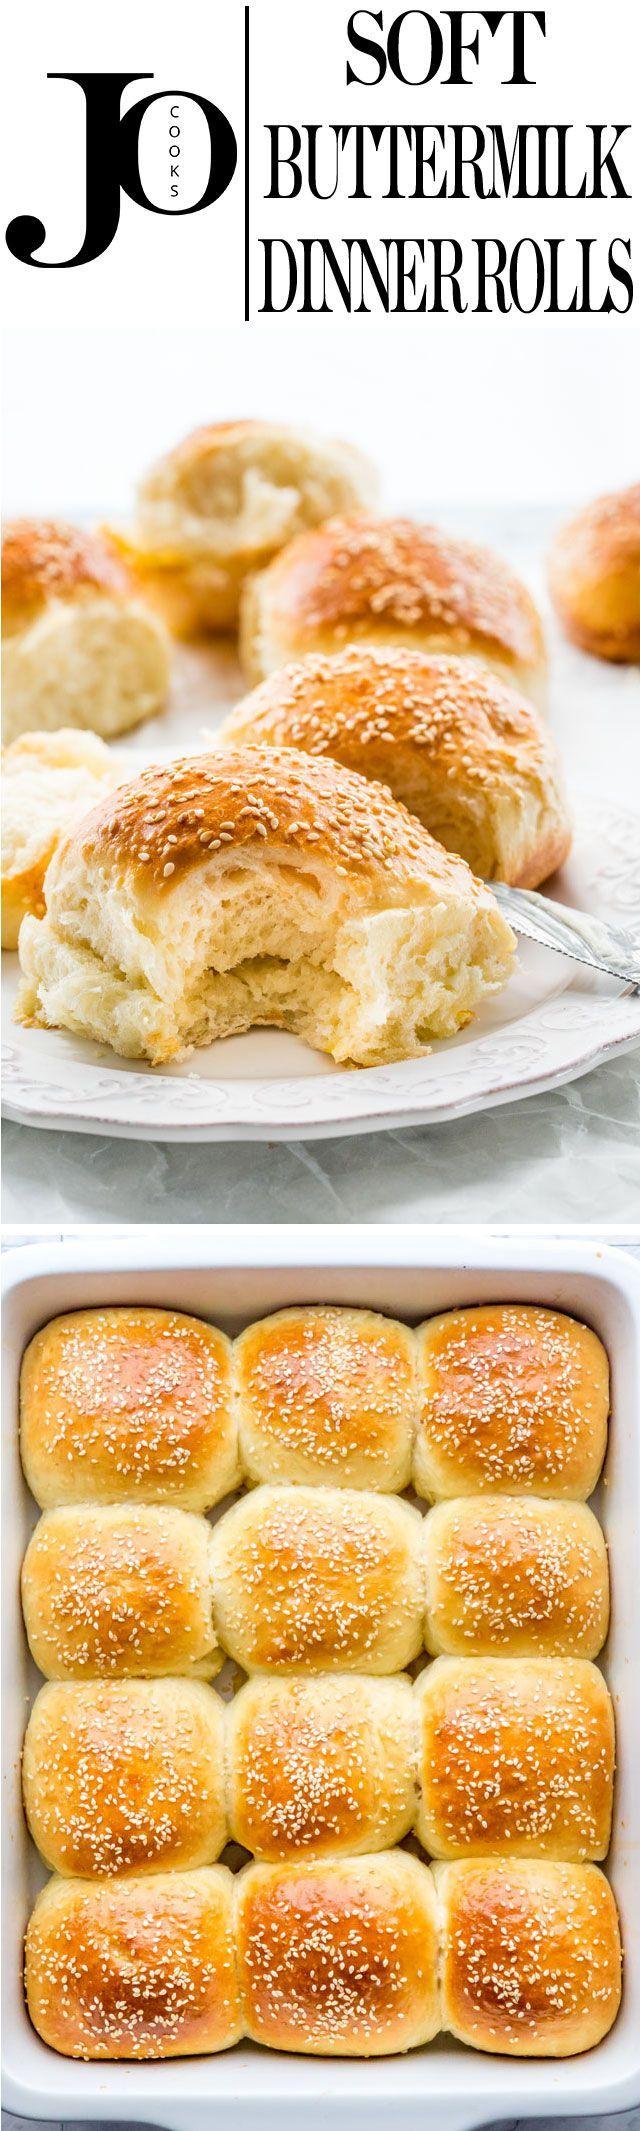 Buttermilk Rolls Dinner Rolls Recipes Food